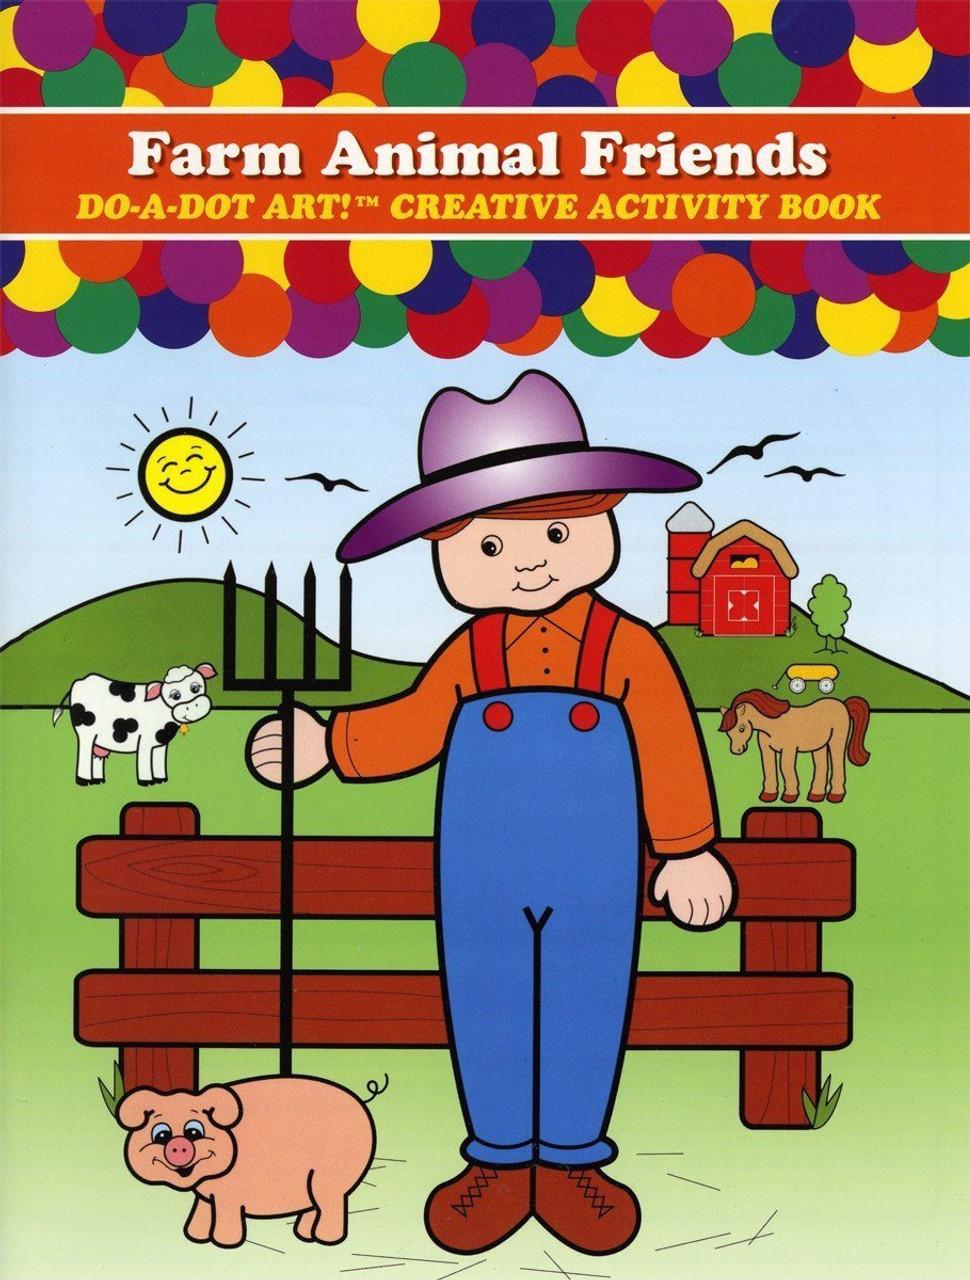 FARM ANIMAL FRIENDS